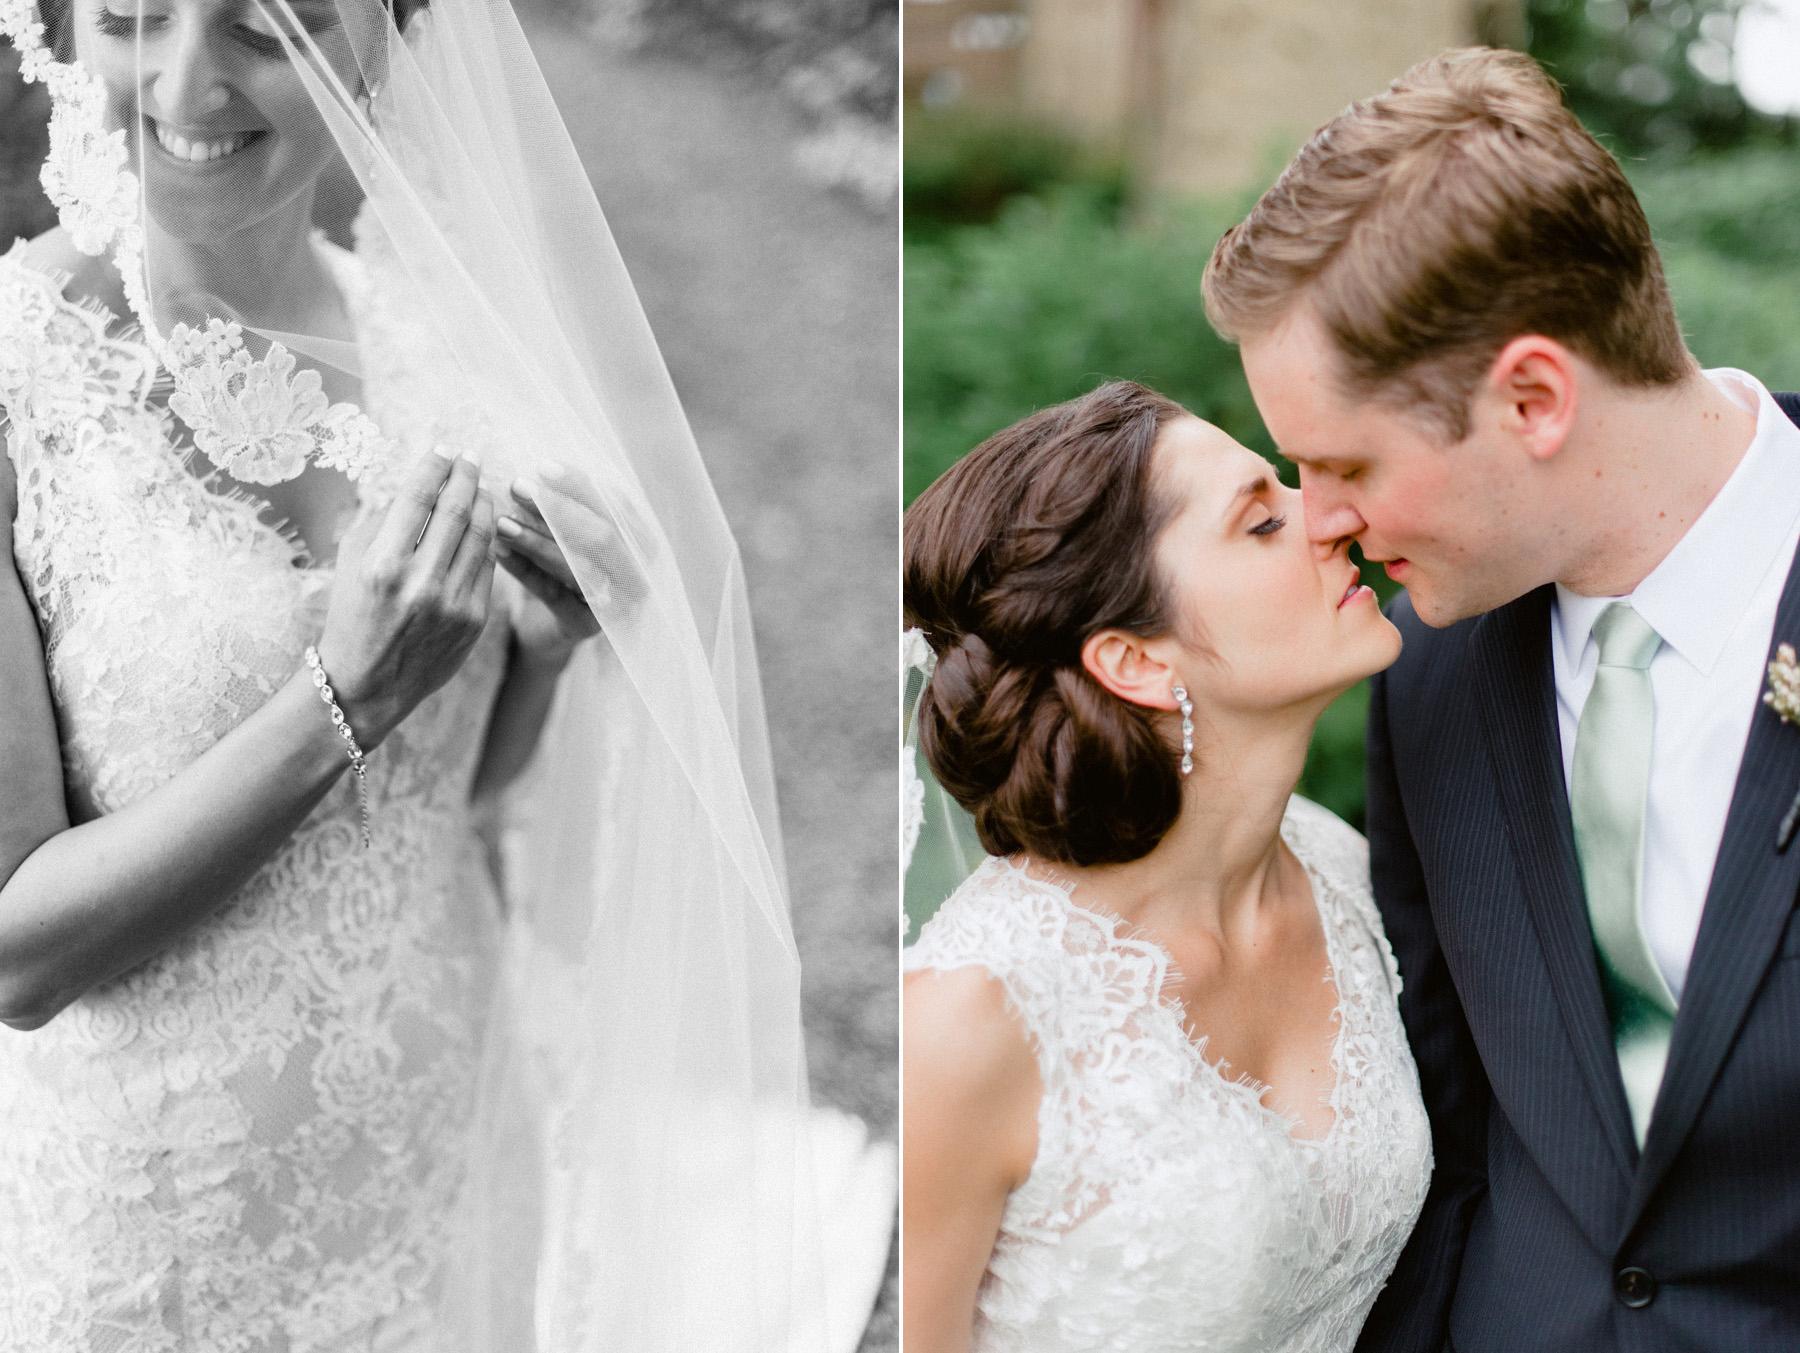 Aga and John - Minneapolis wedding photography